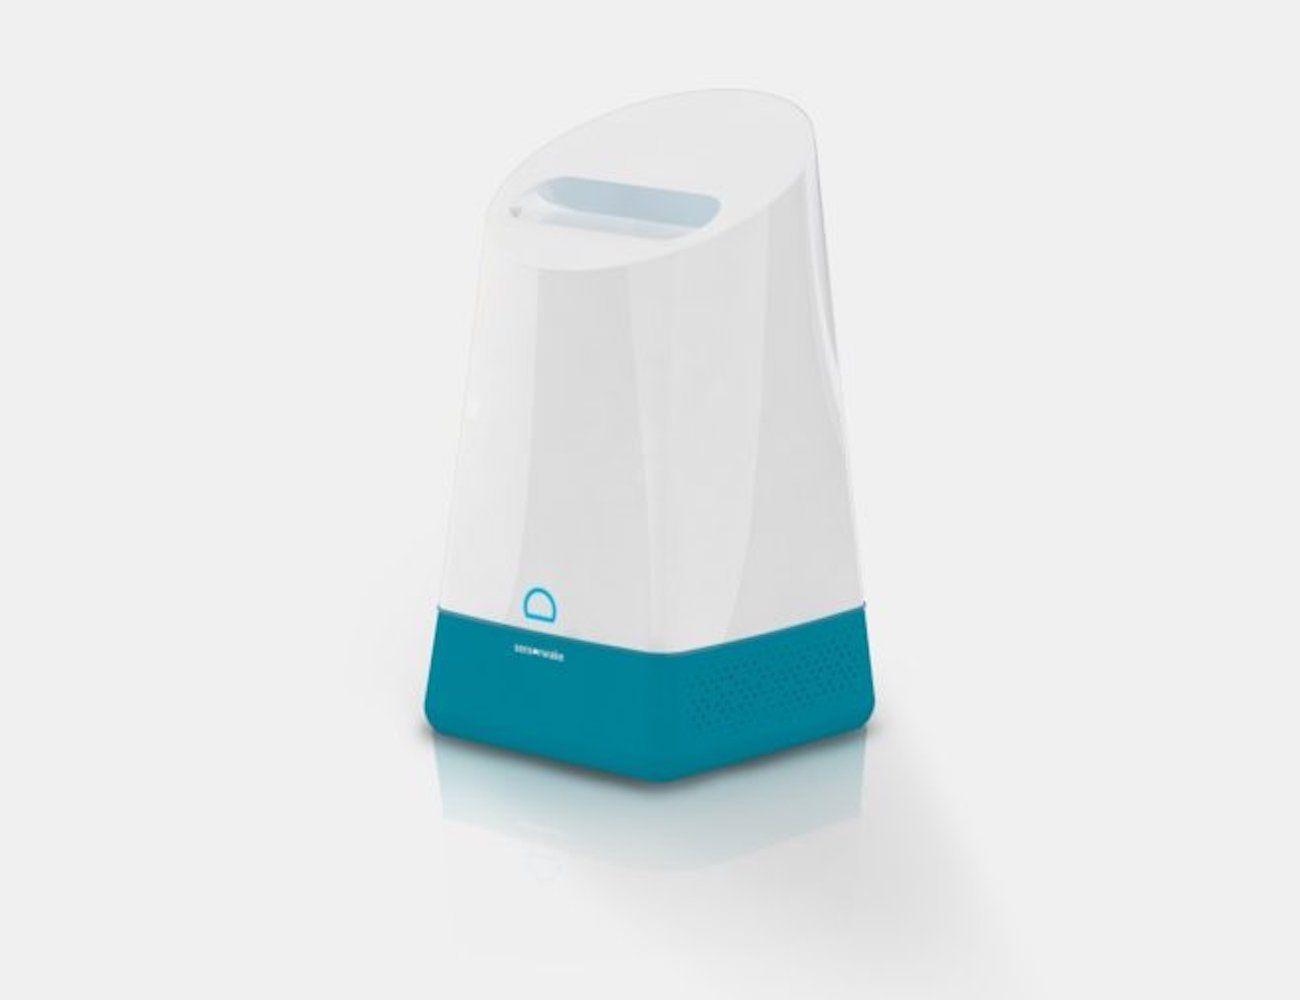 Sensorwake Oria Olfactory Sleep Enhancer